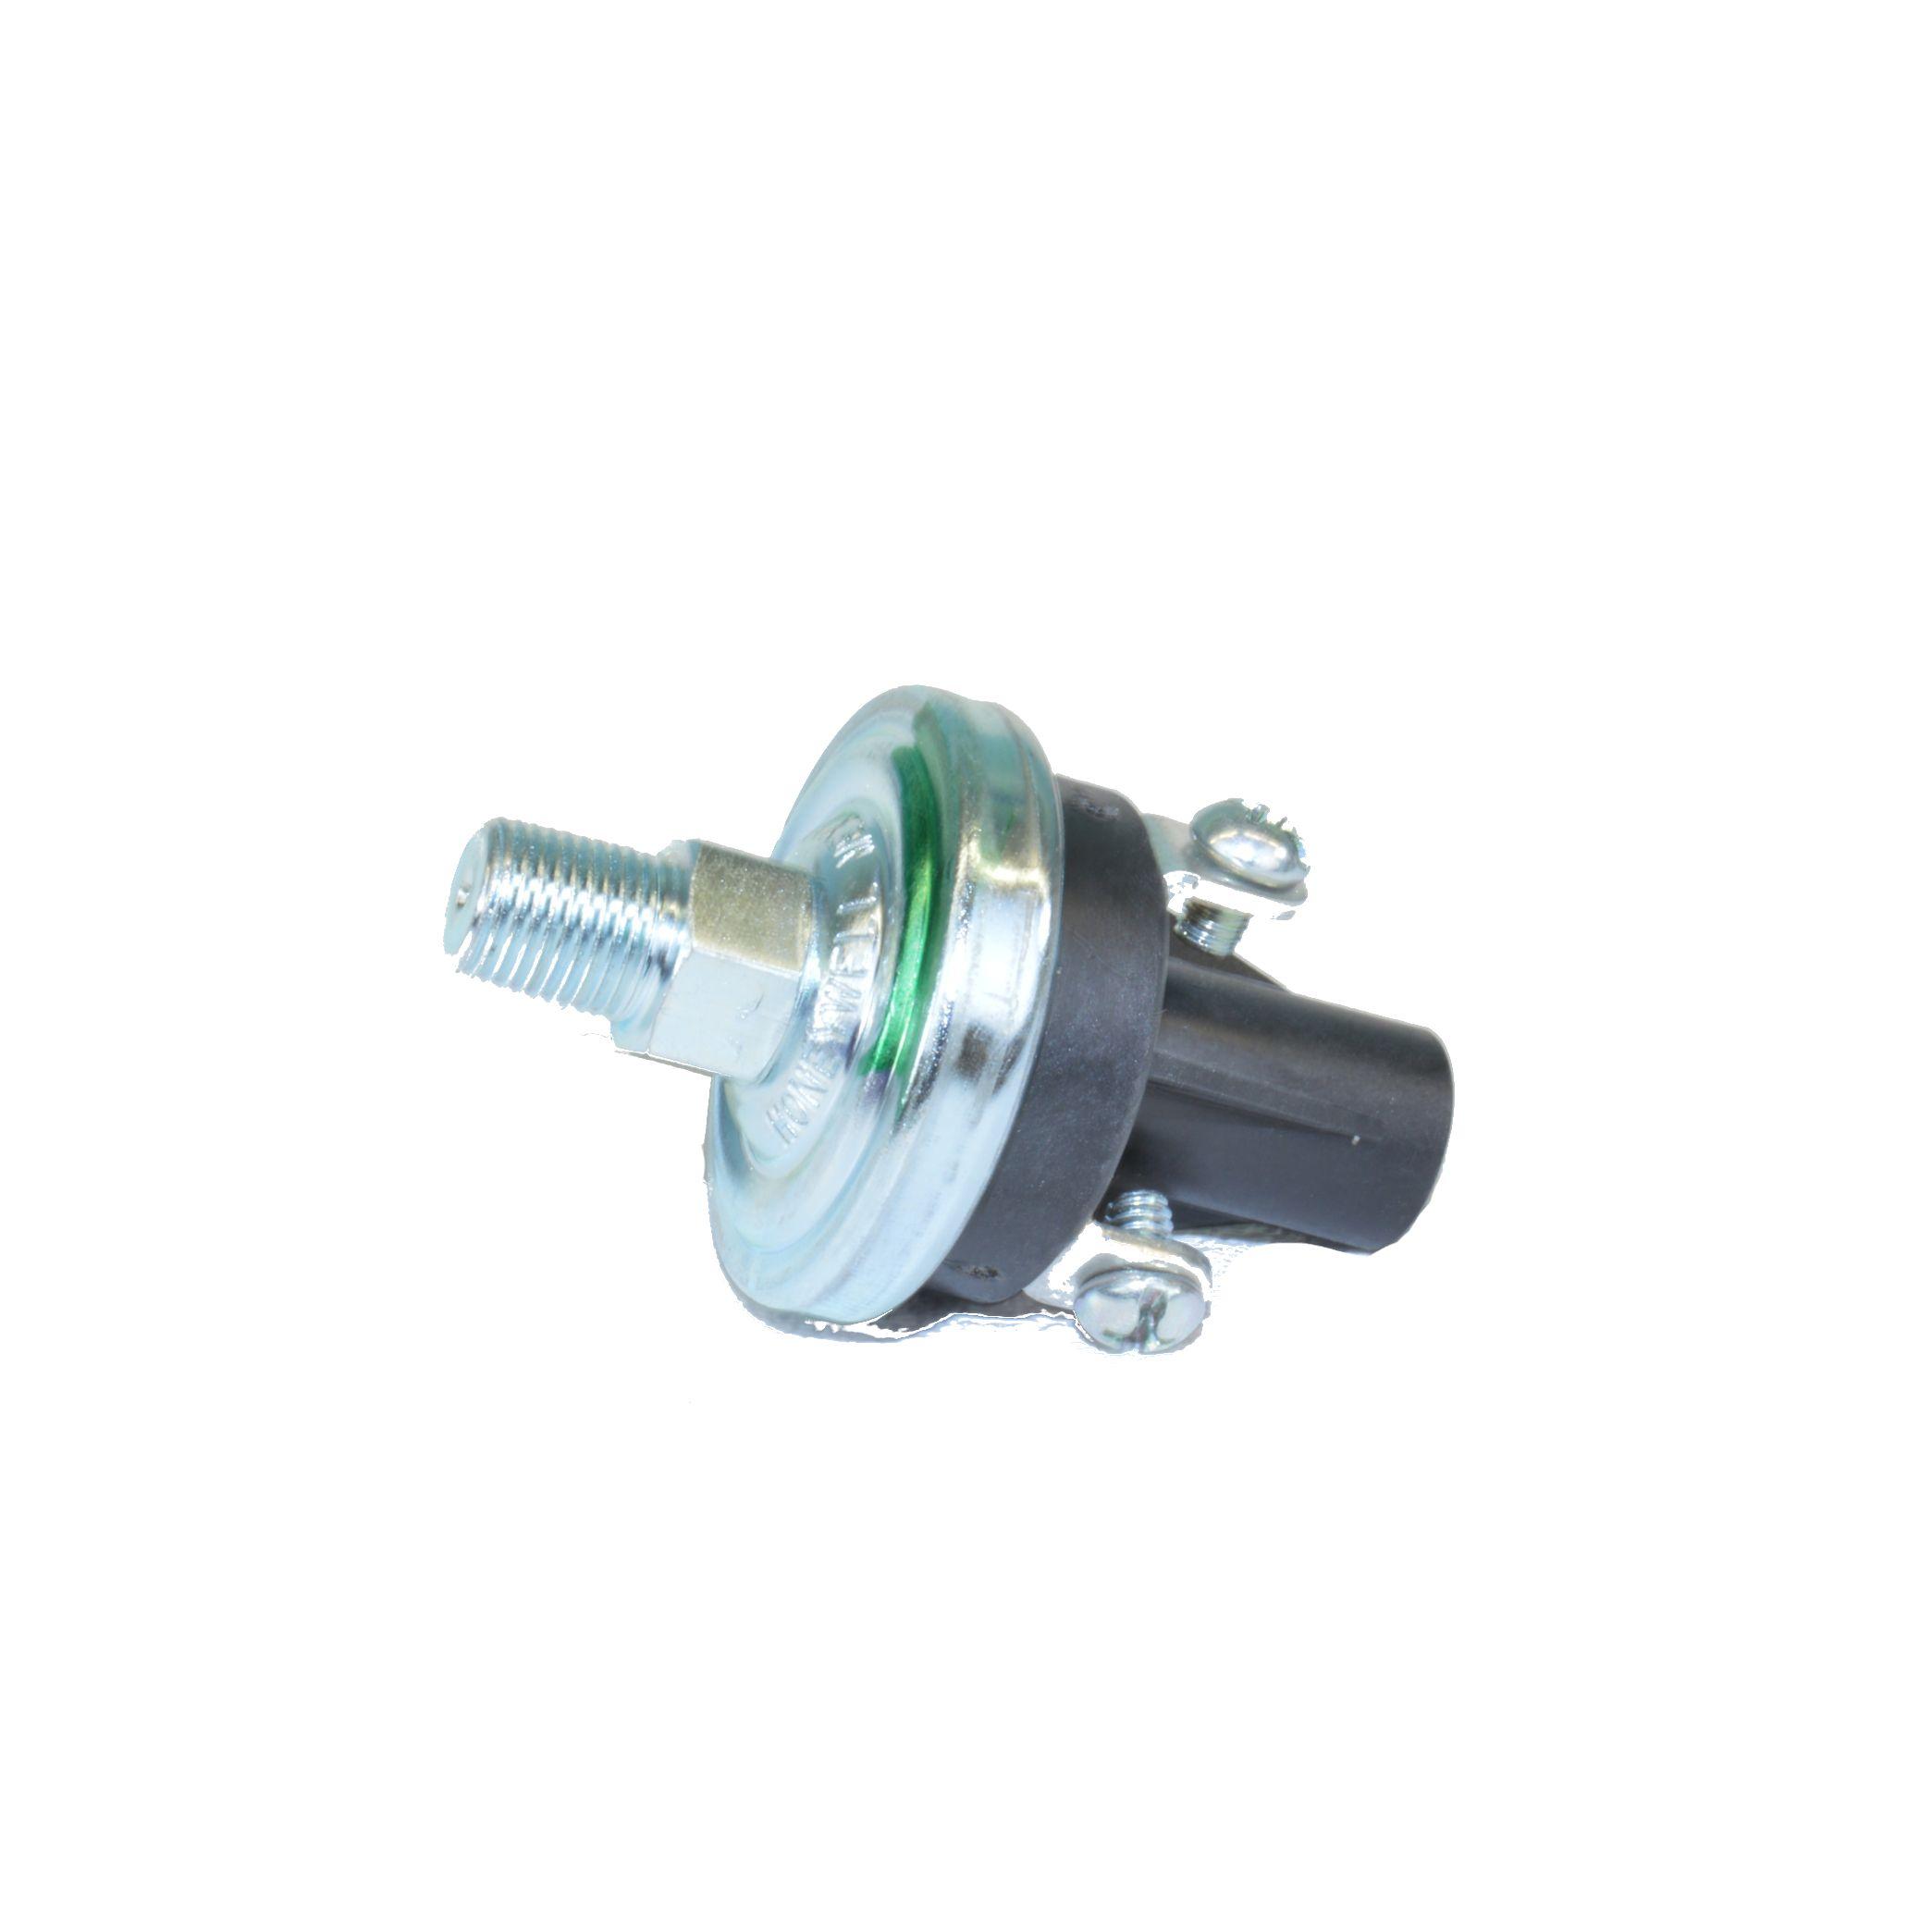 Indmar Fuel Pump Safety & Walters V-Drive Oil Pressure